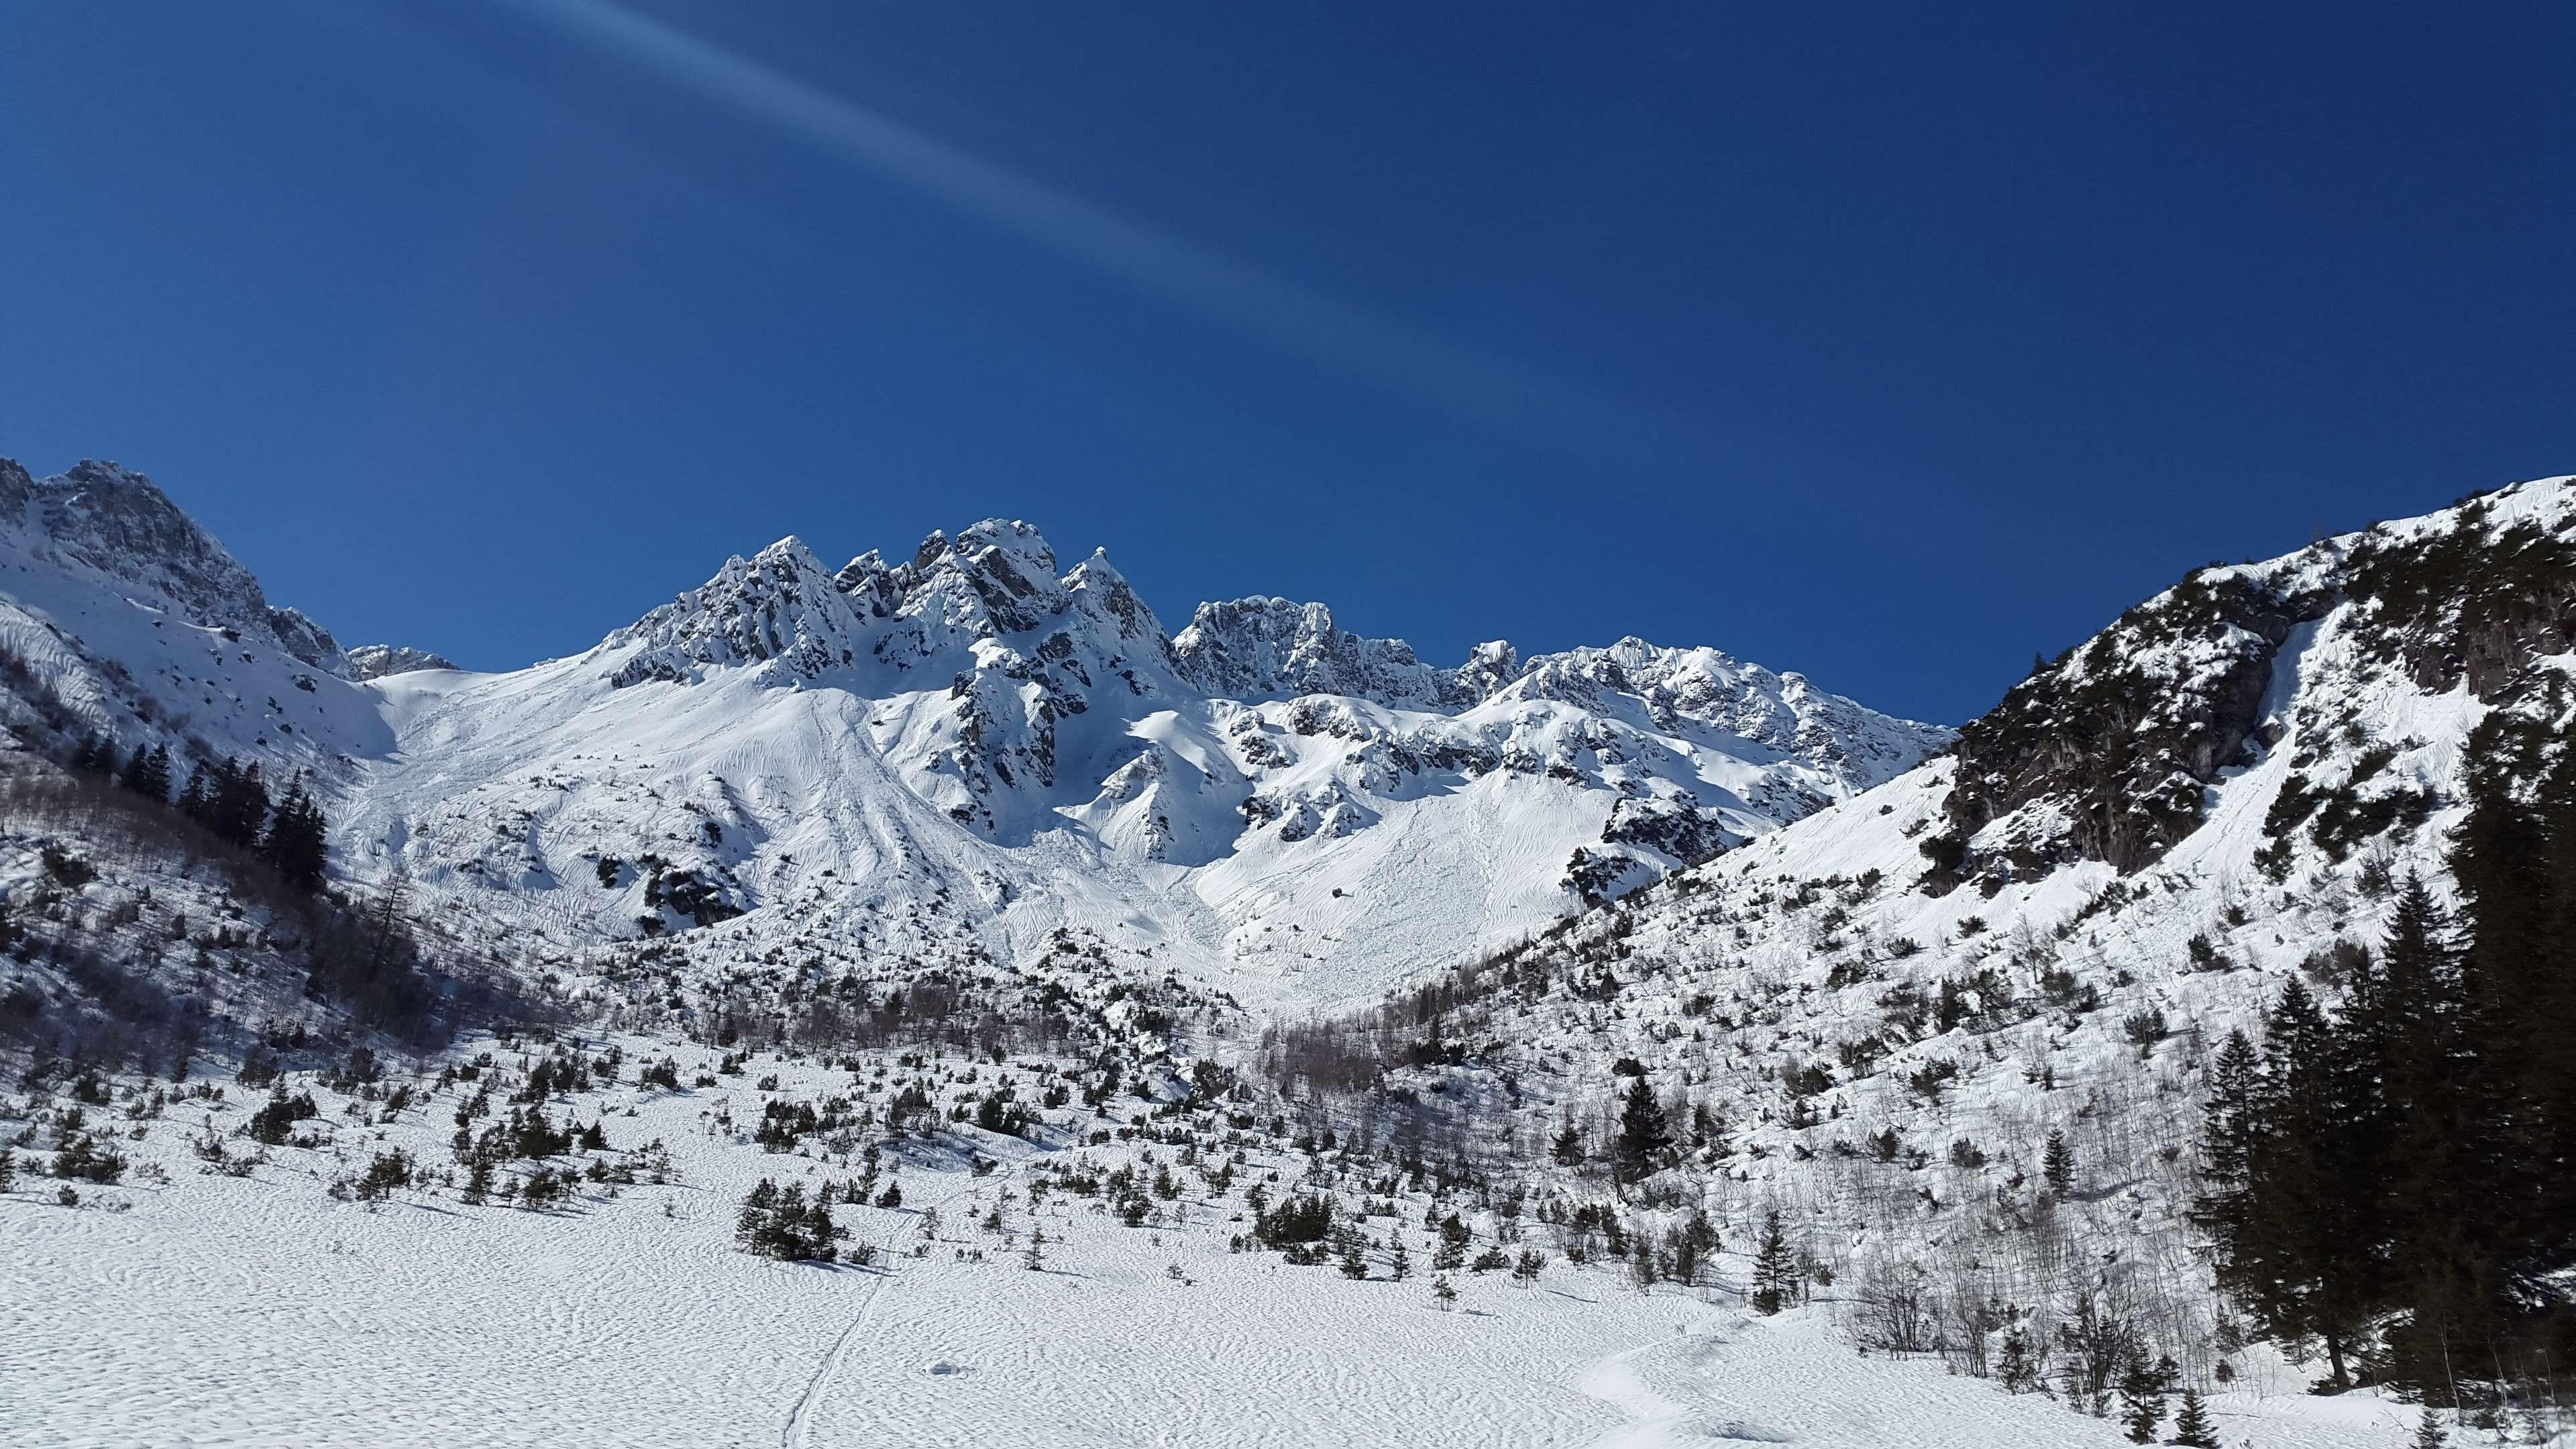 3840x2160 Allgu Alpine Alpine Panorama Fiderepass Fiderepasshtte High Tip Of The Miter Landscape Mountain Range Mountaineering Mountains Nature Partl